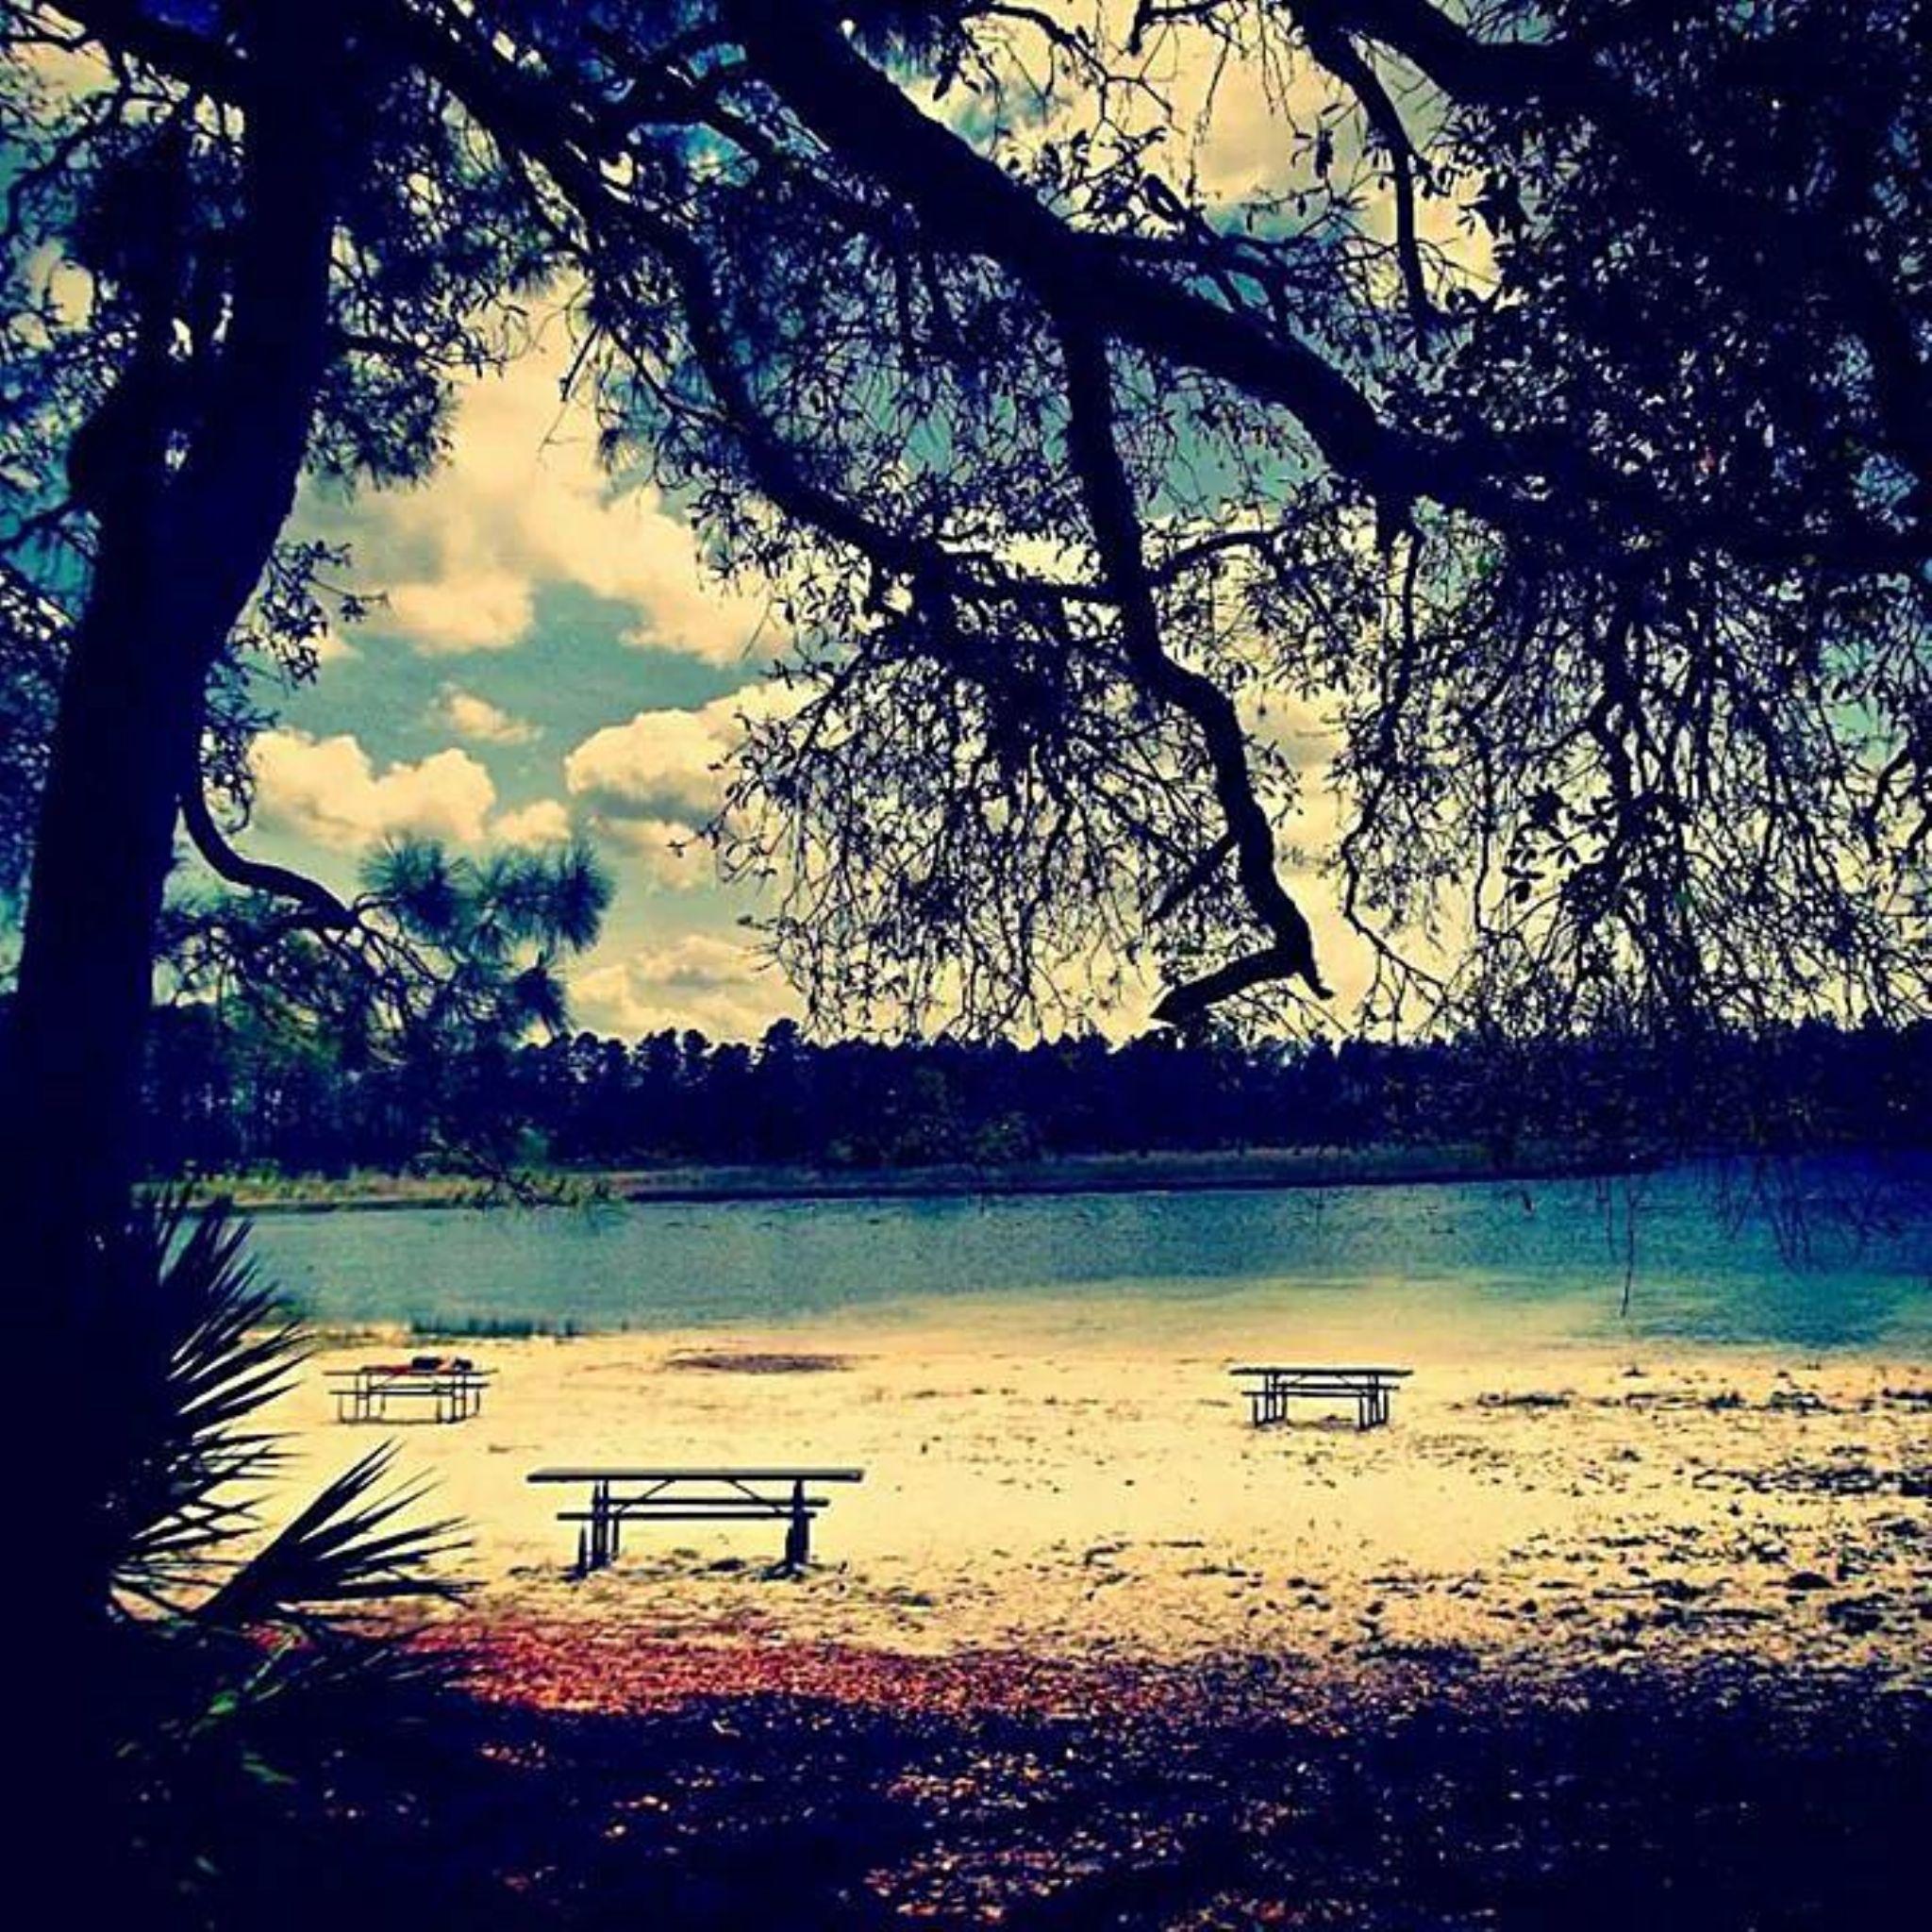 Clearwater lake. by Chelsey Elizabeth